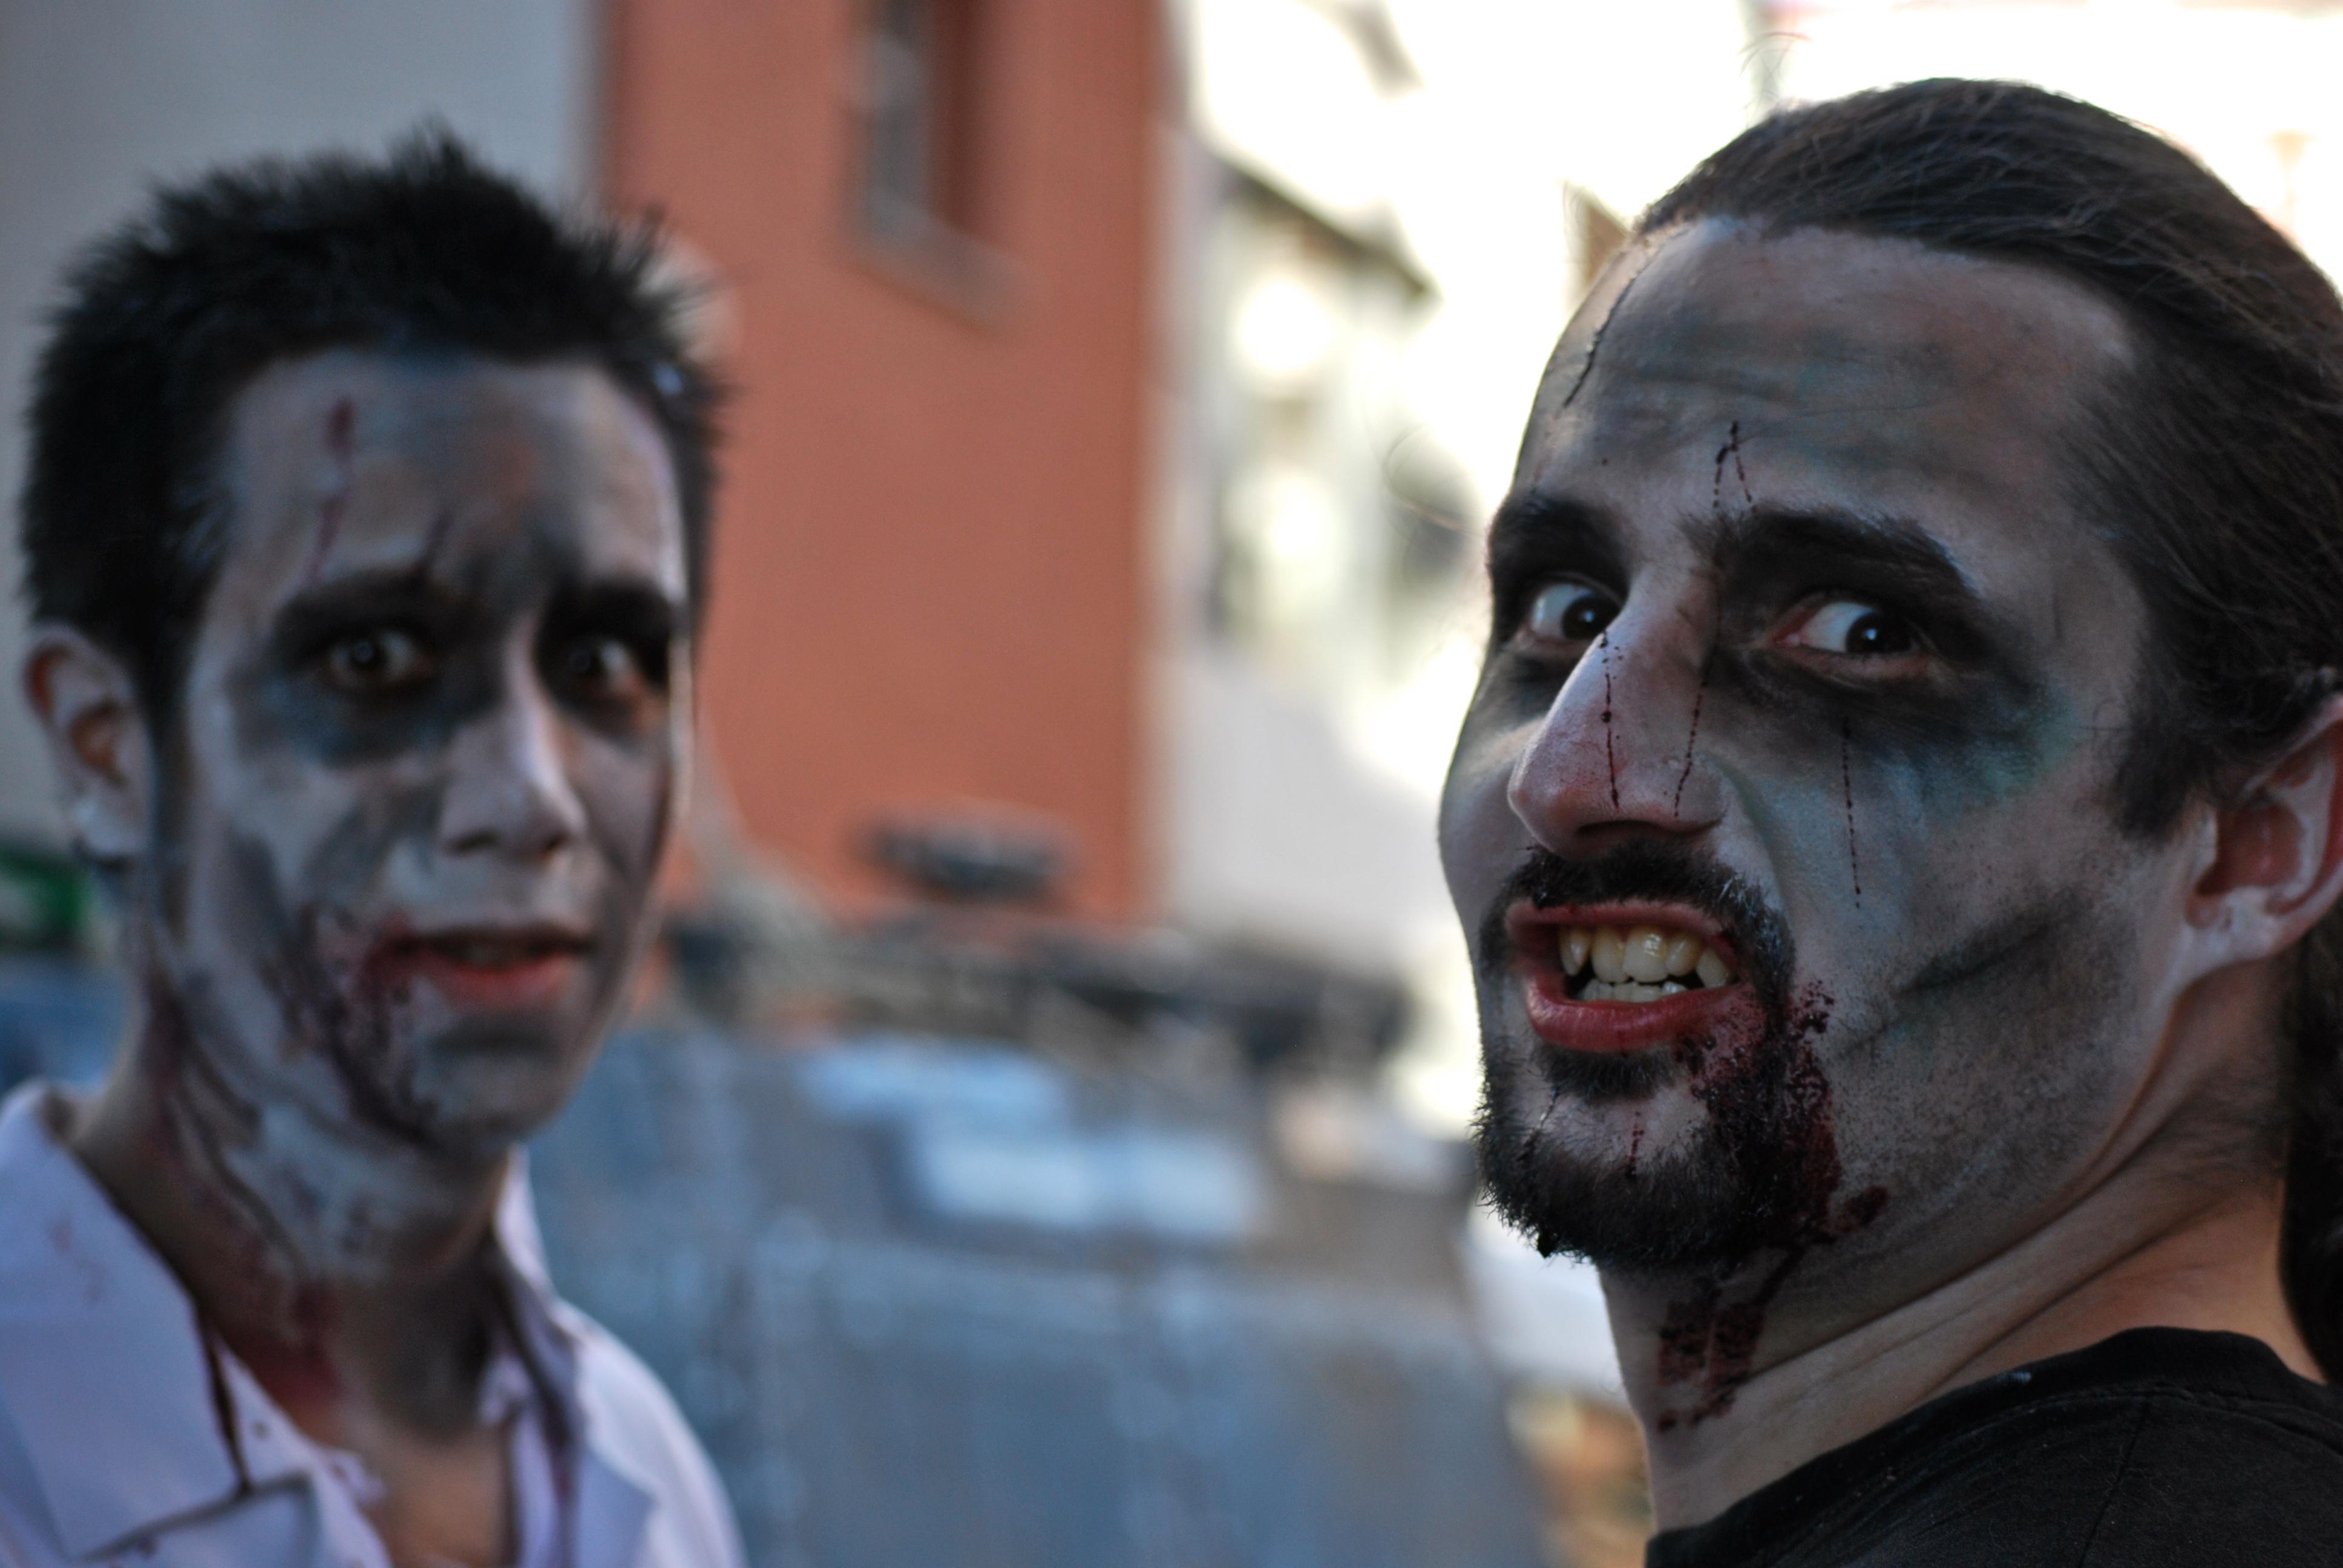 Les morts-vivants ont envahi Toulouse